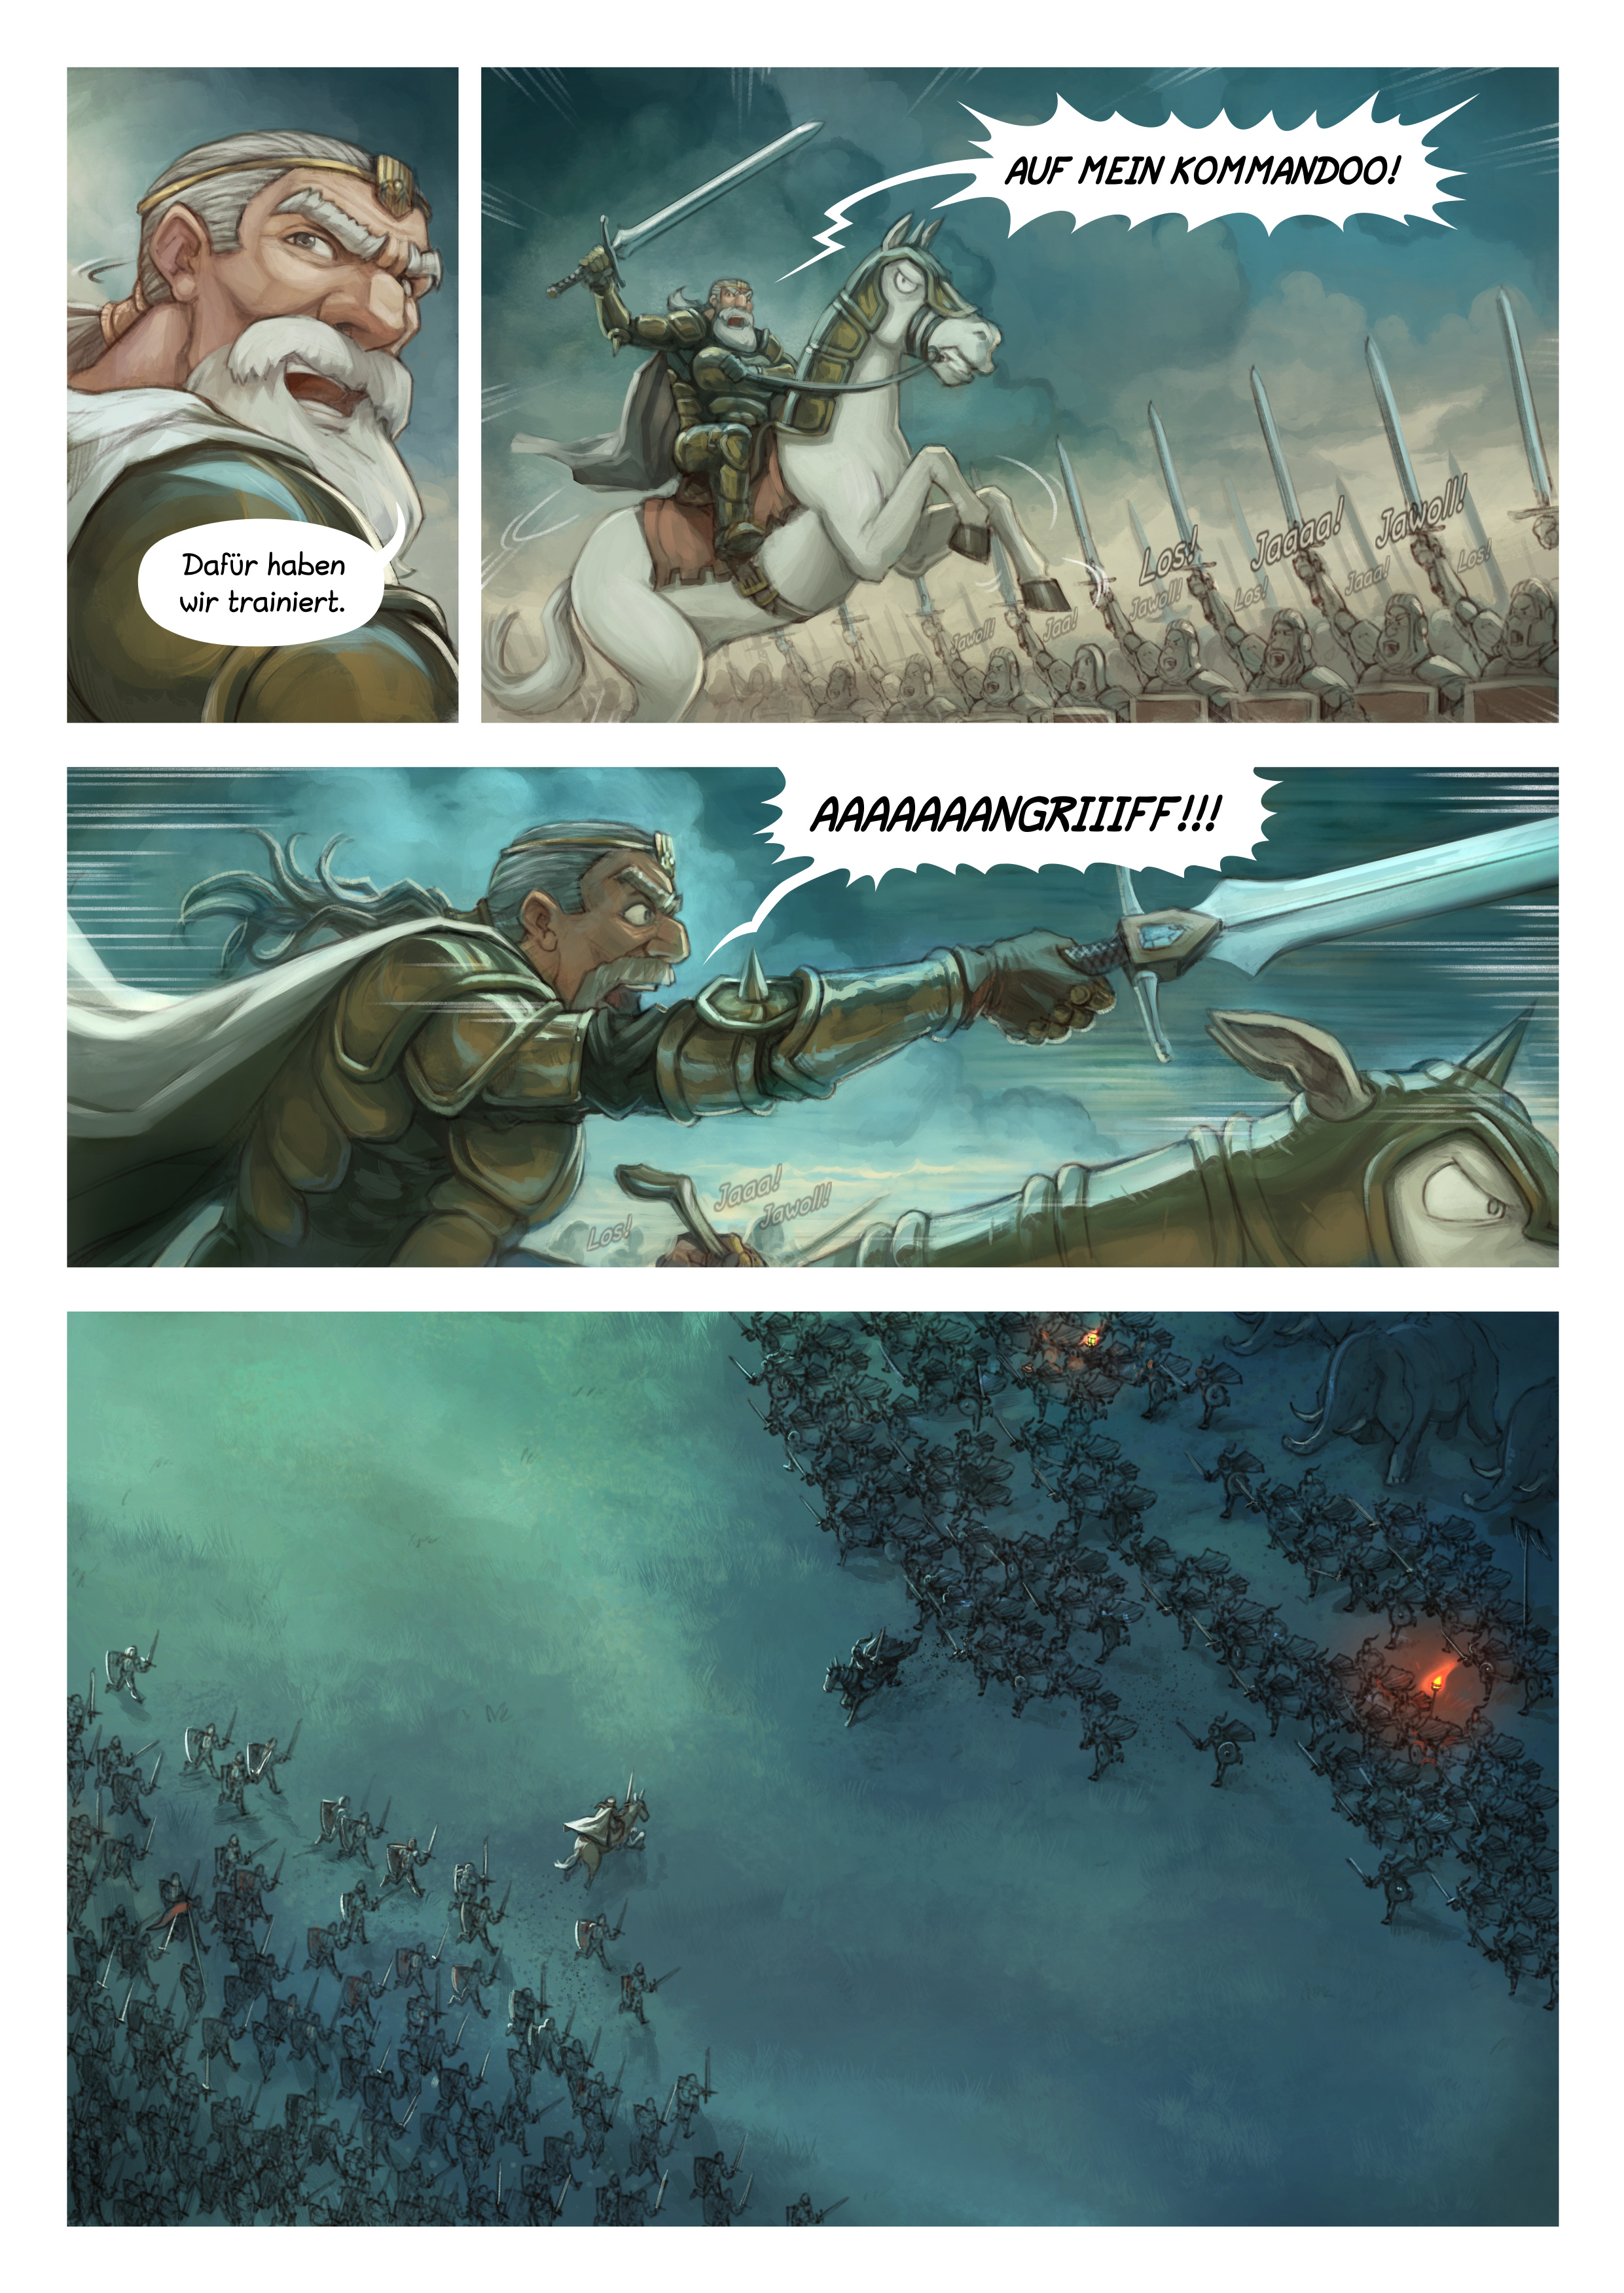 Episode 33: Zauberhafter Krieg, Page 4